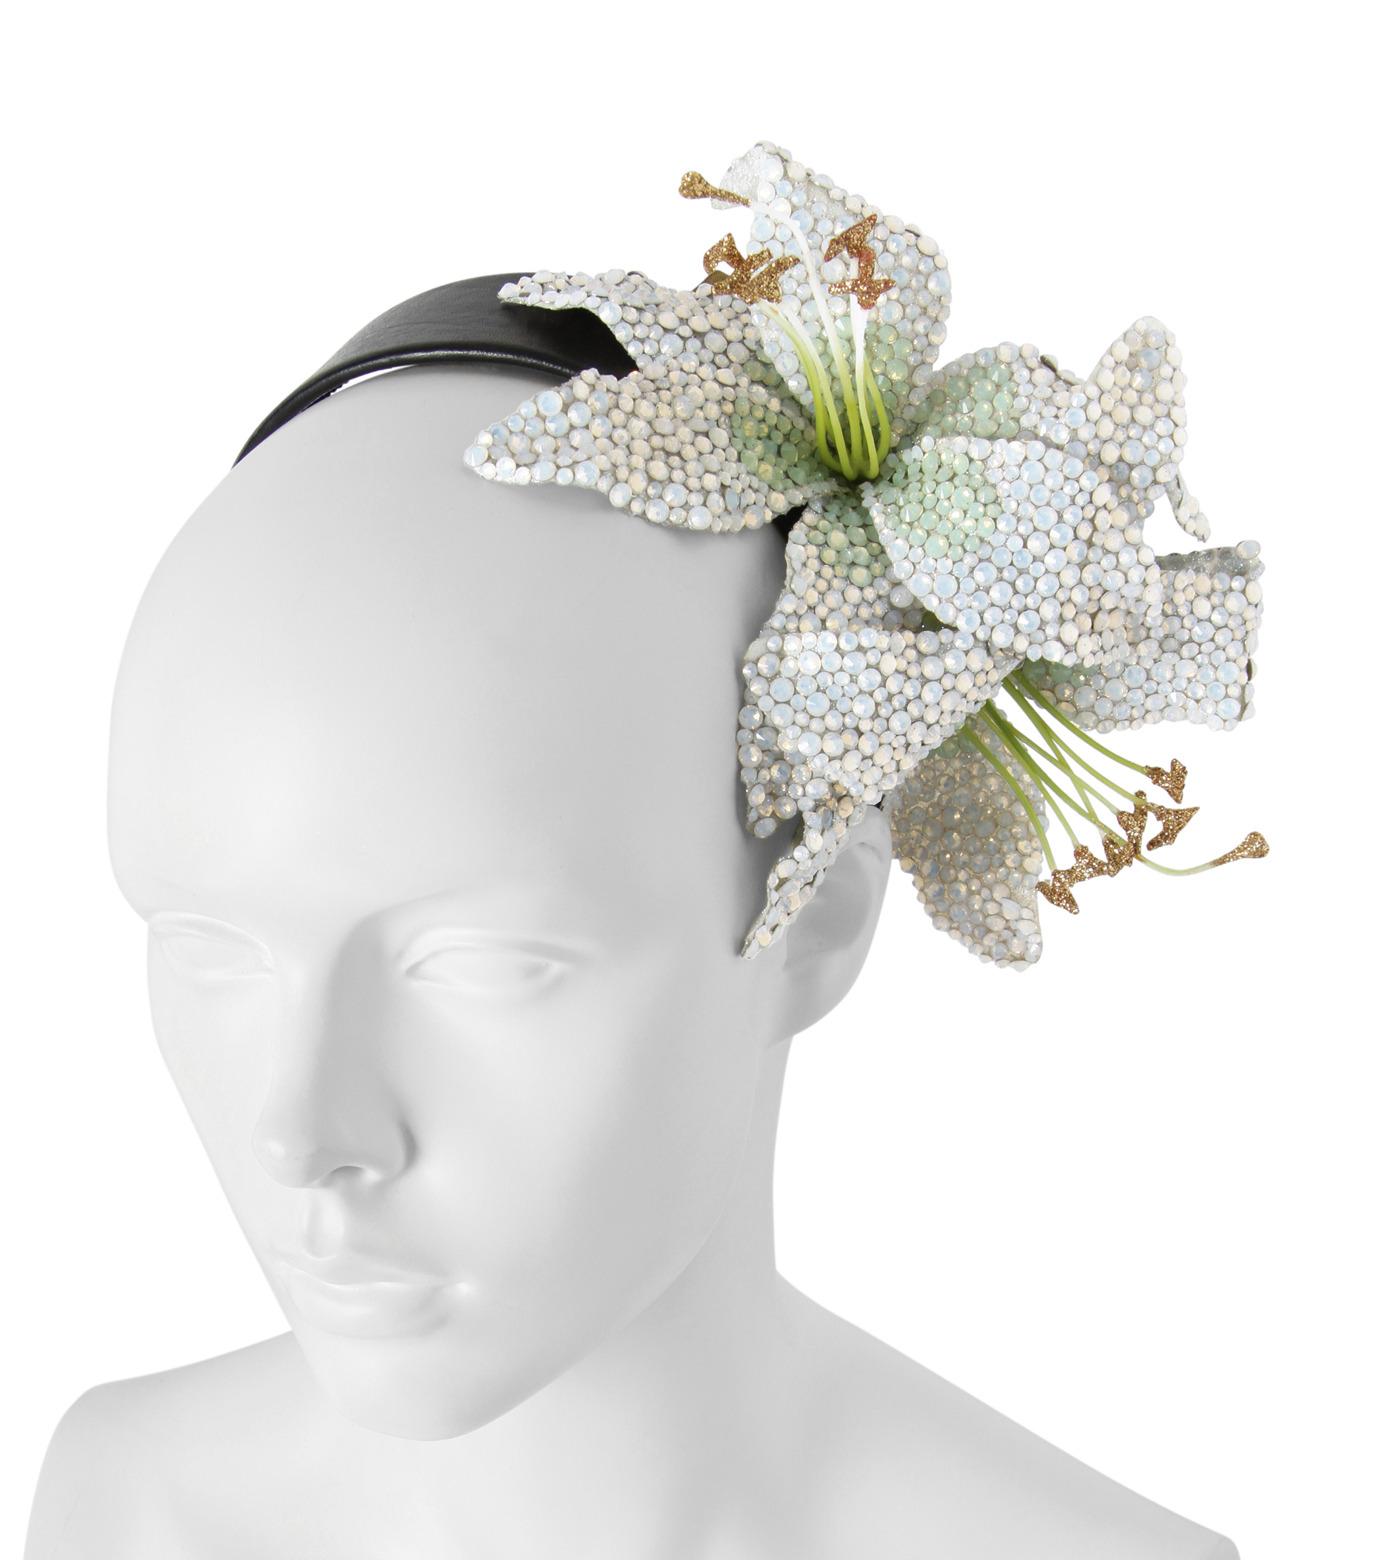 Piers Atkinson(ピアーズ アトキンソン)のSwarovski Crystal Encrusted Lilyes-WHITE(アクセサリー/accessory)-PA-24-4 拡大詳細画像3